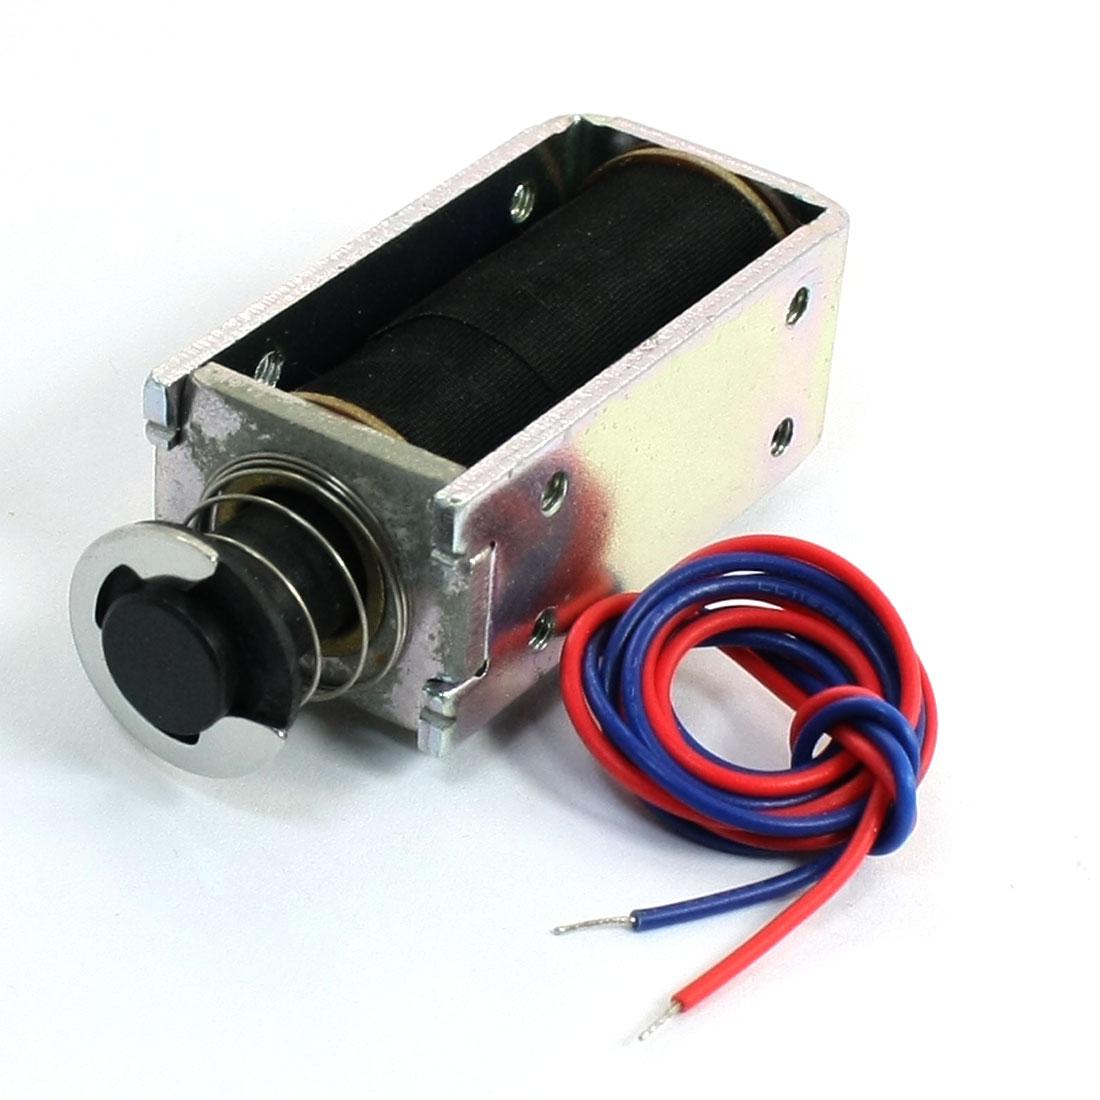 0.7lb Spring Plunger Push Pull Linear Electromagnet Solenoid DC 24V 0.34A